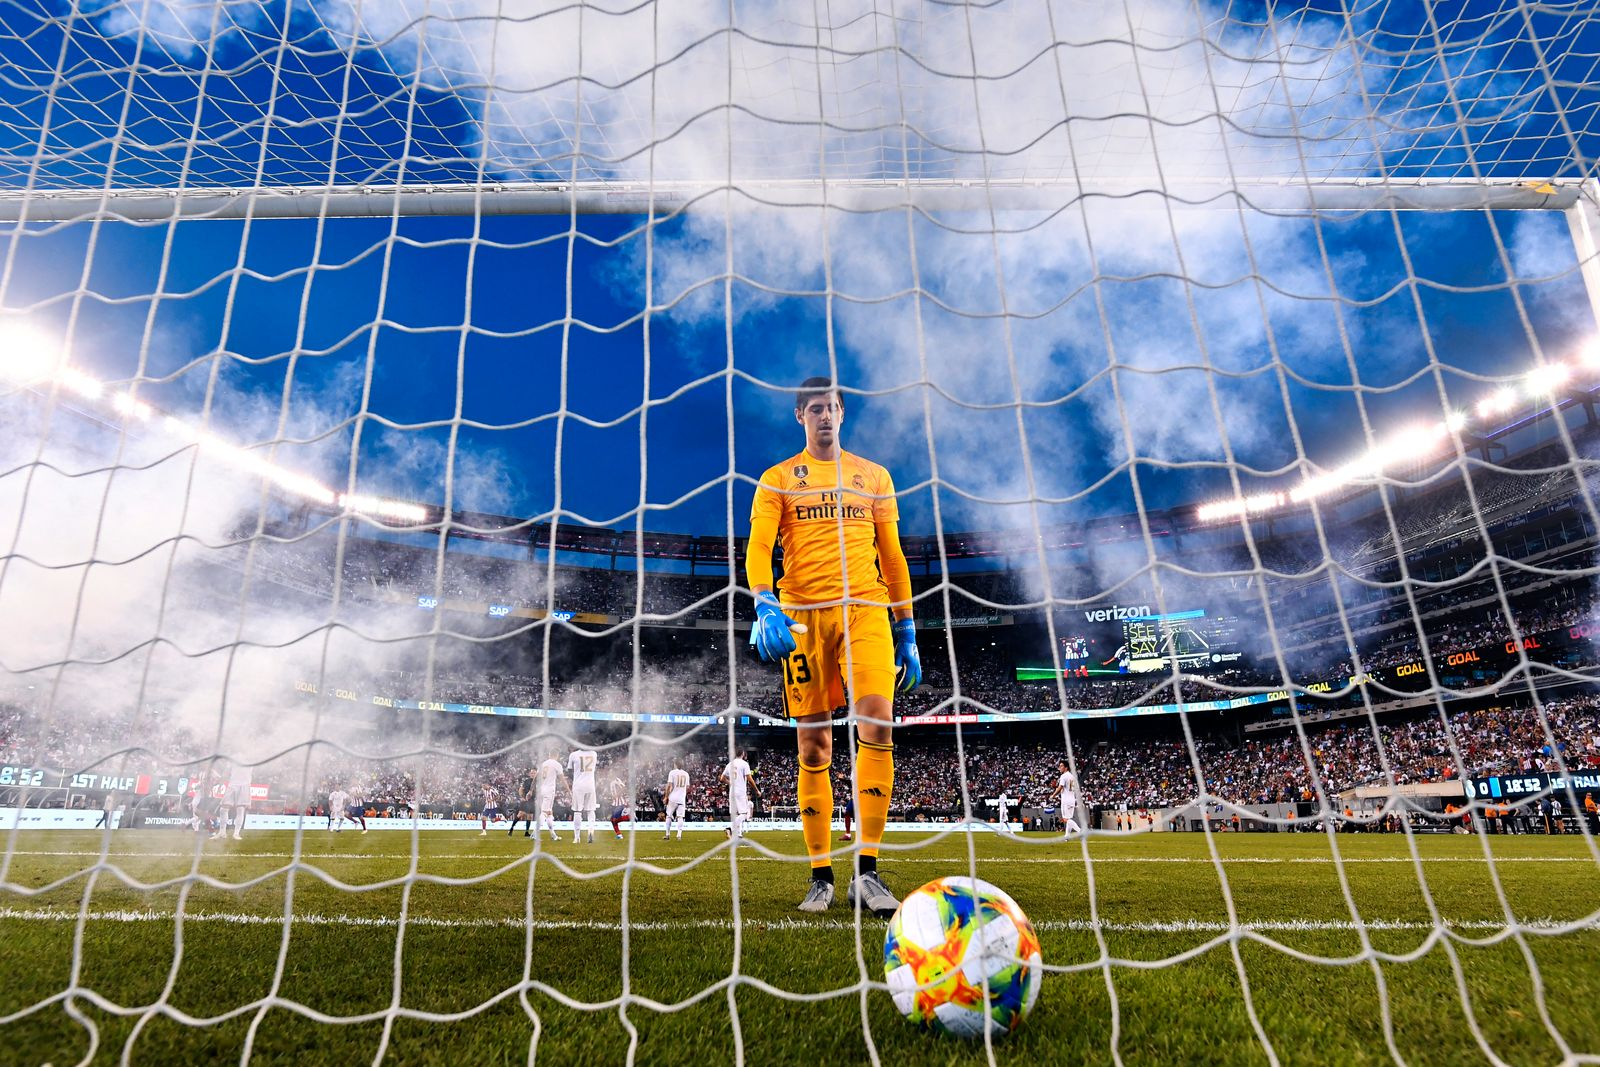 Football - Real Madrid v Atletico de Madrid - 2019 International Champions Cup